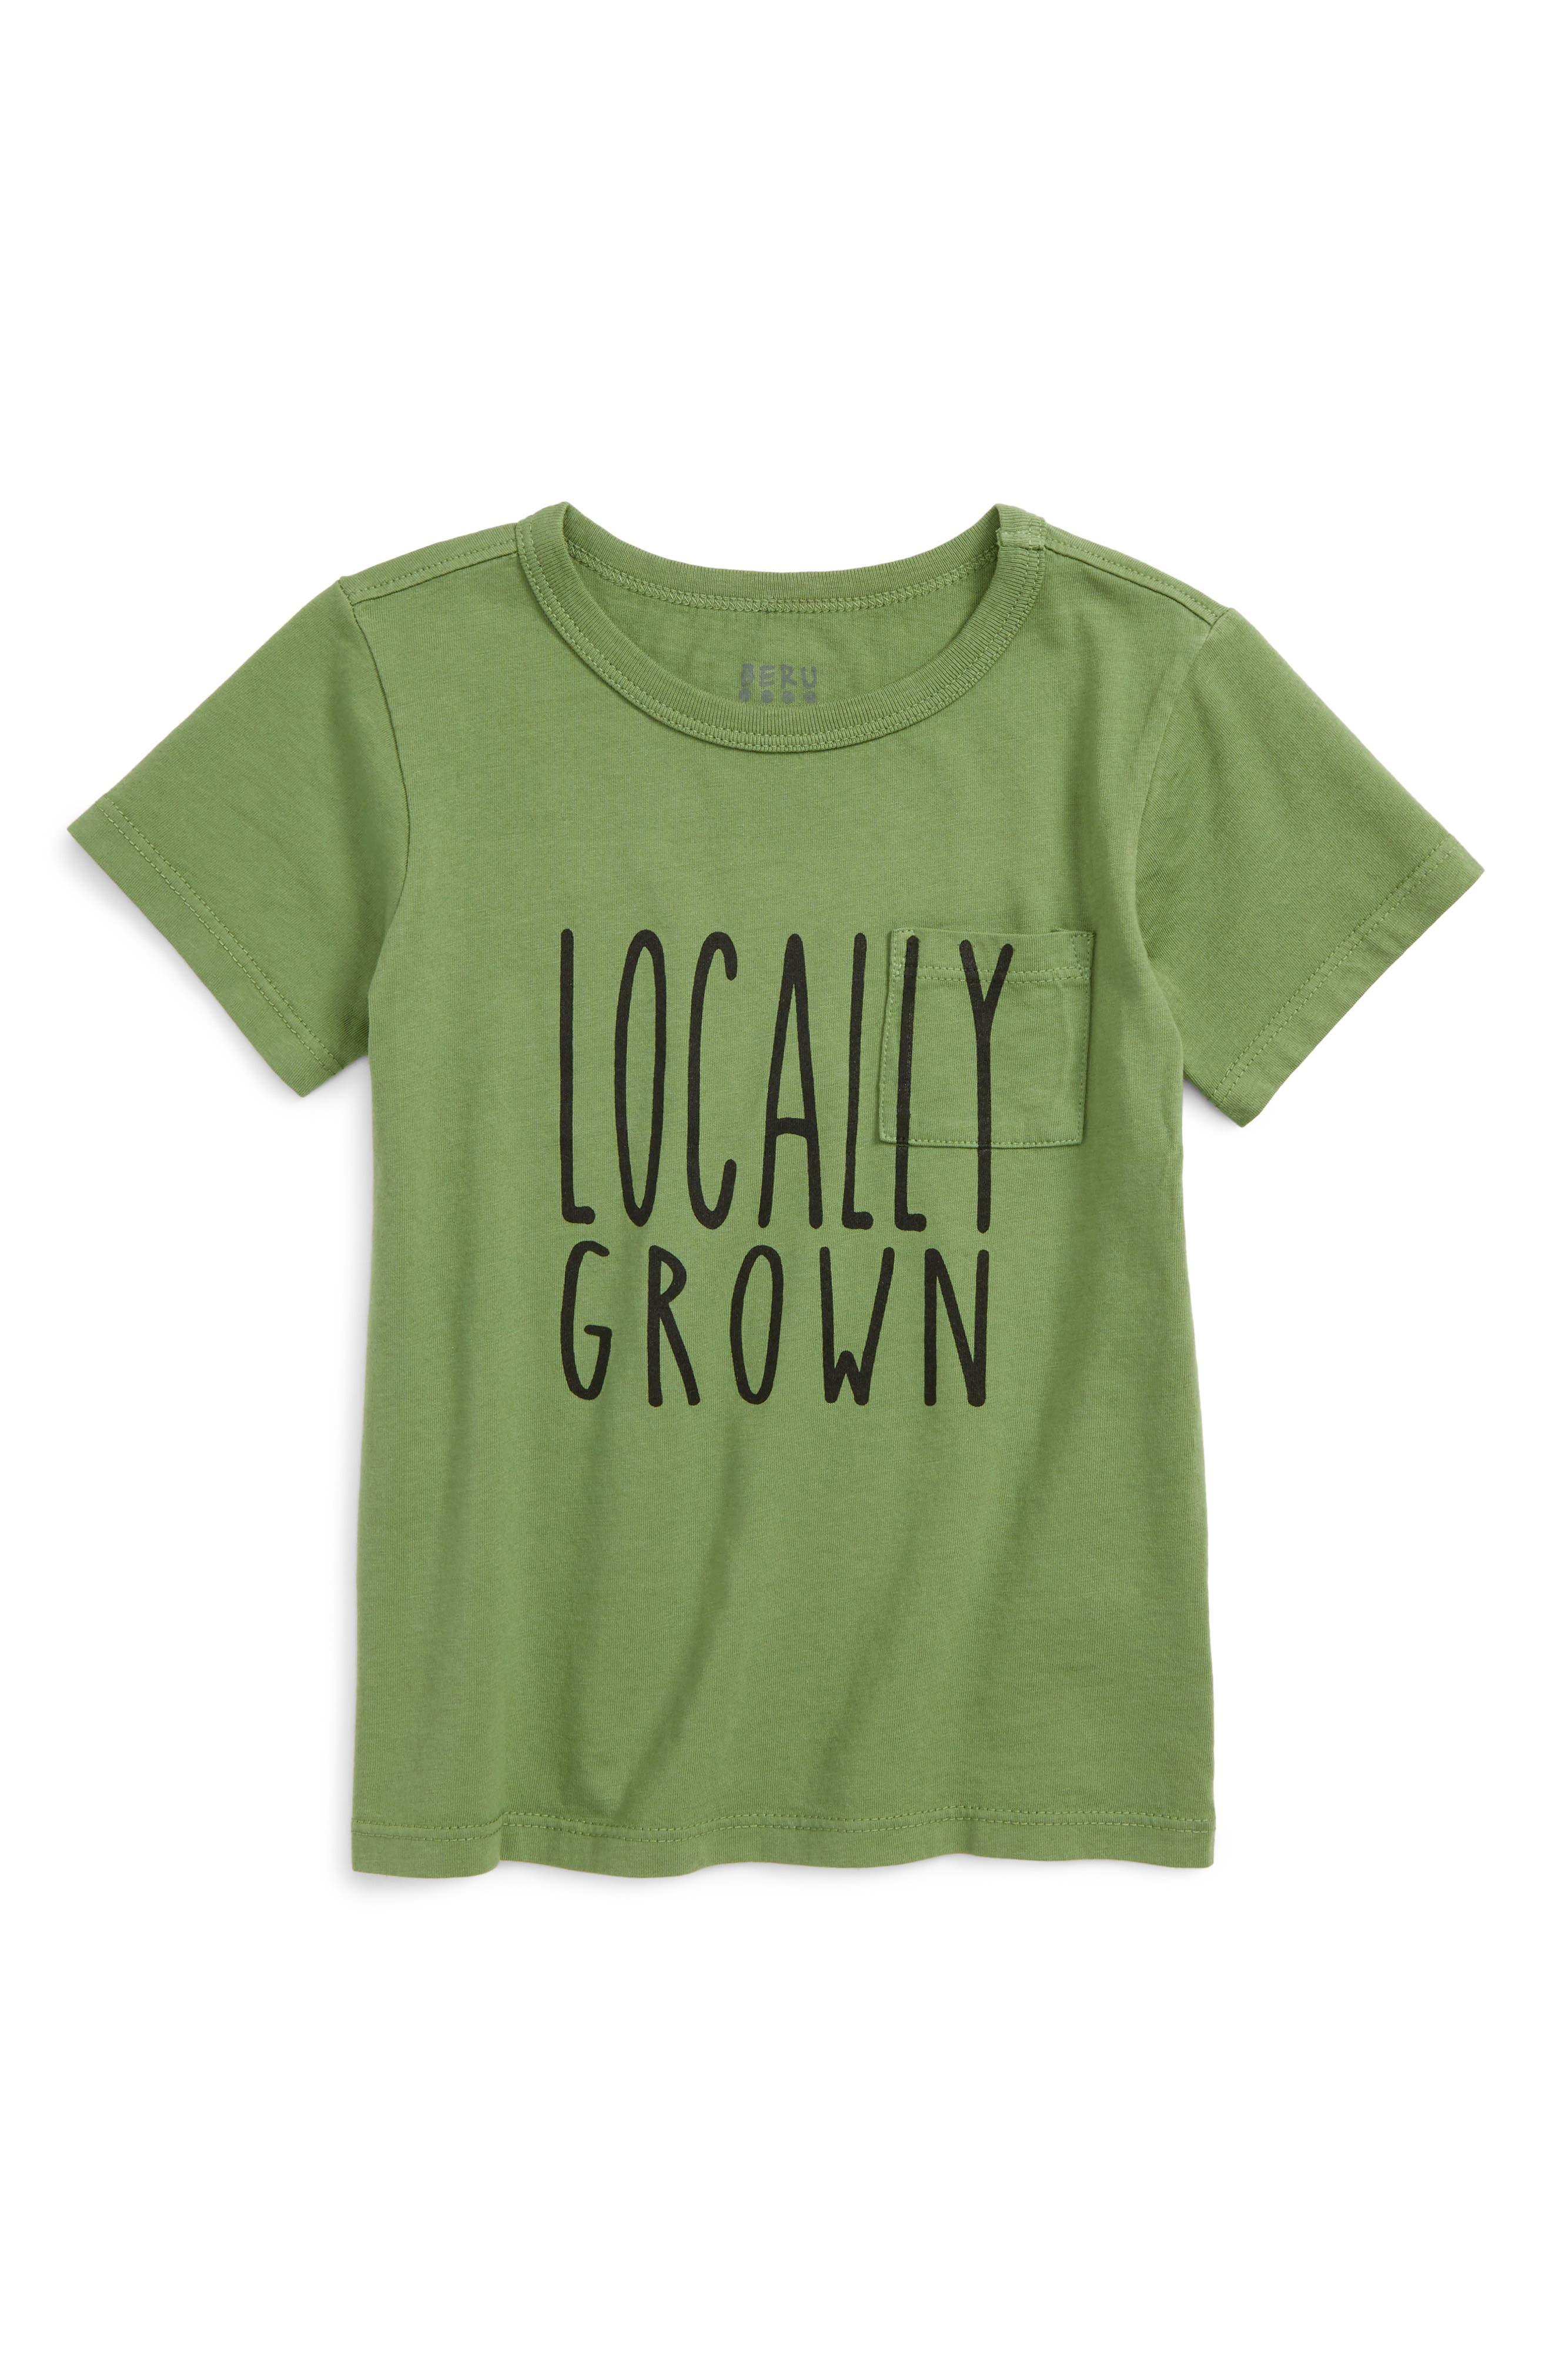 BERU Locally Grown Organic Cotton T-Shirt